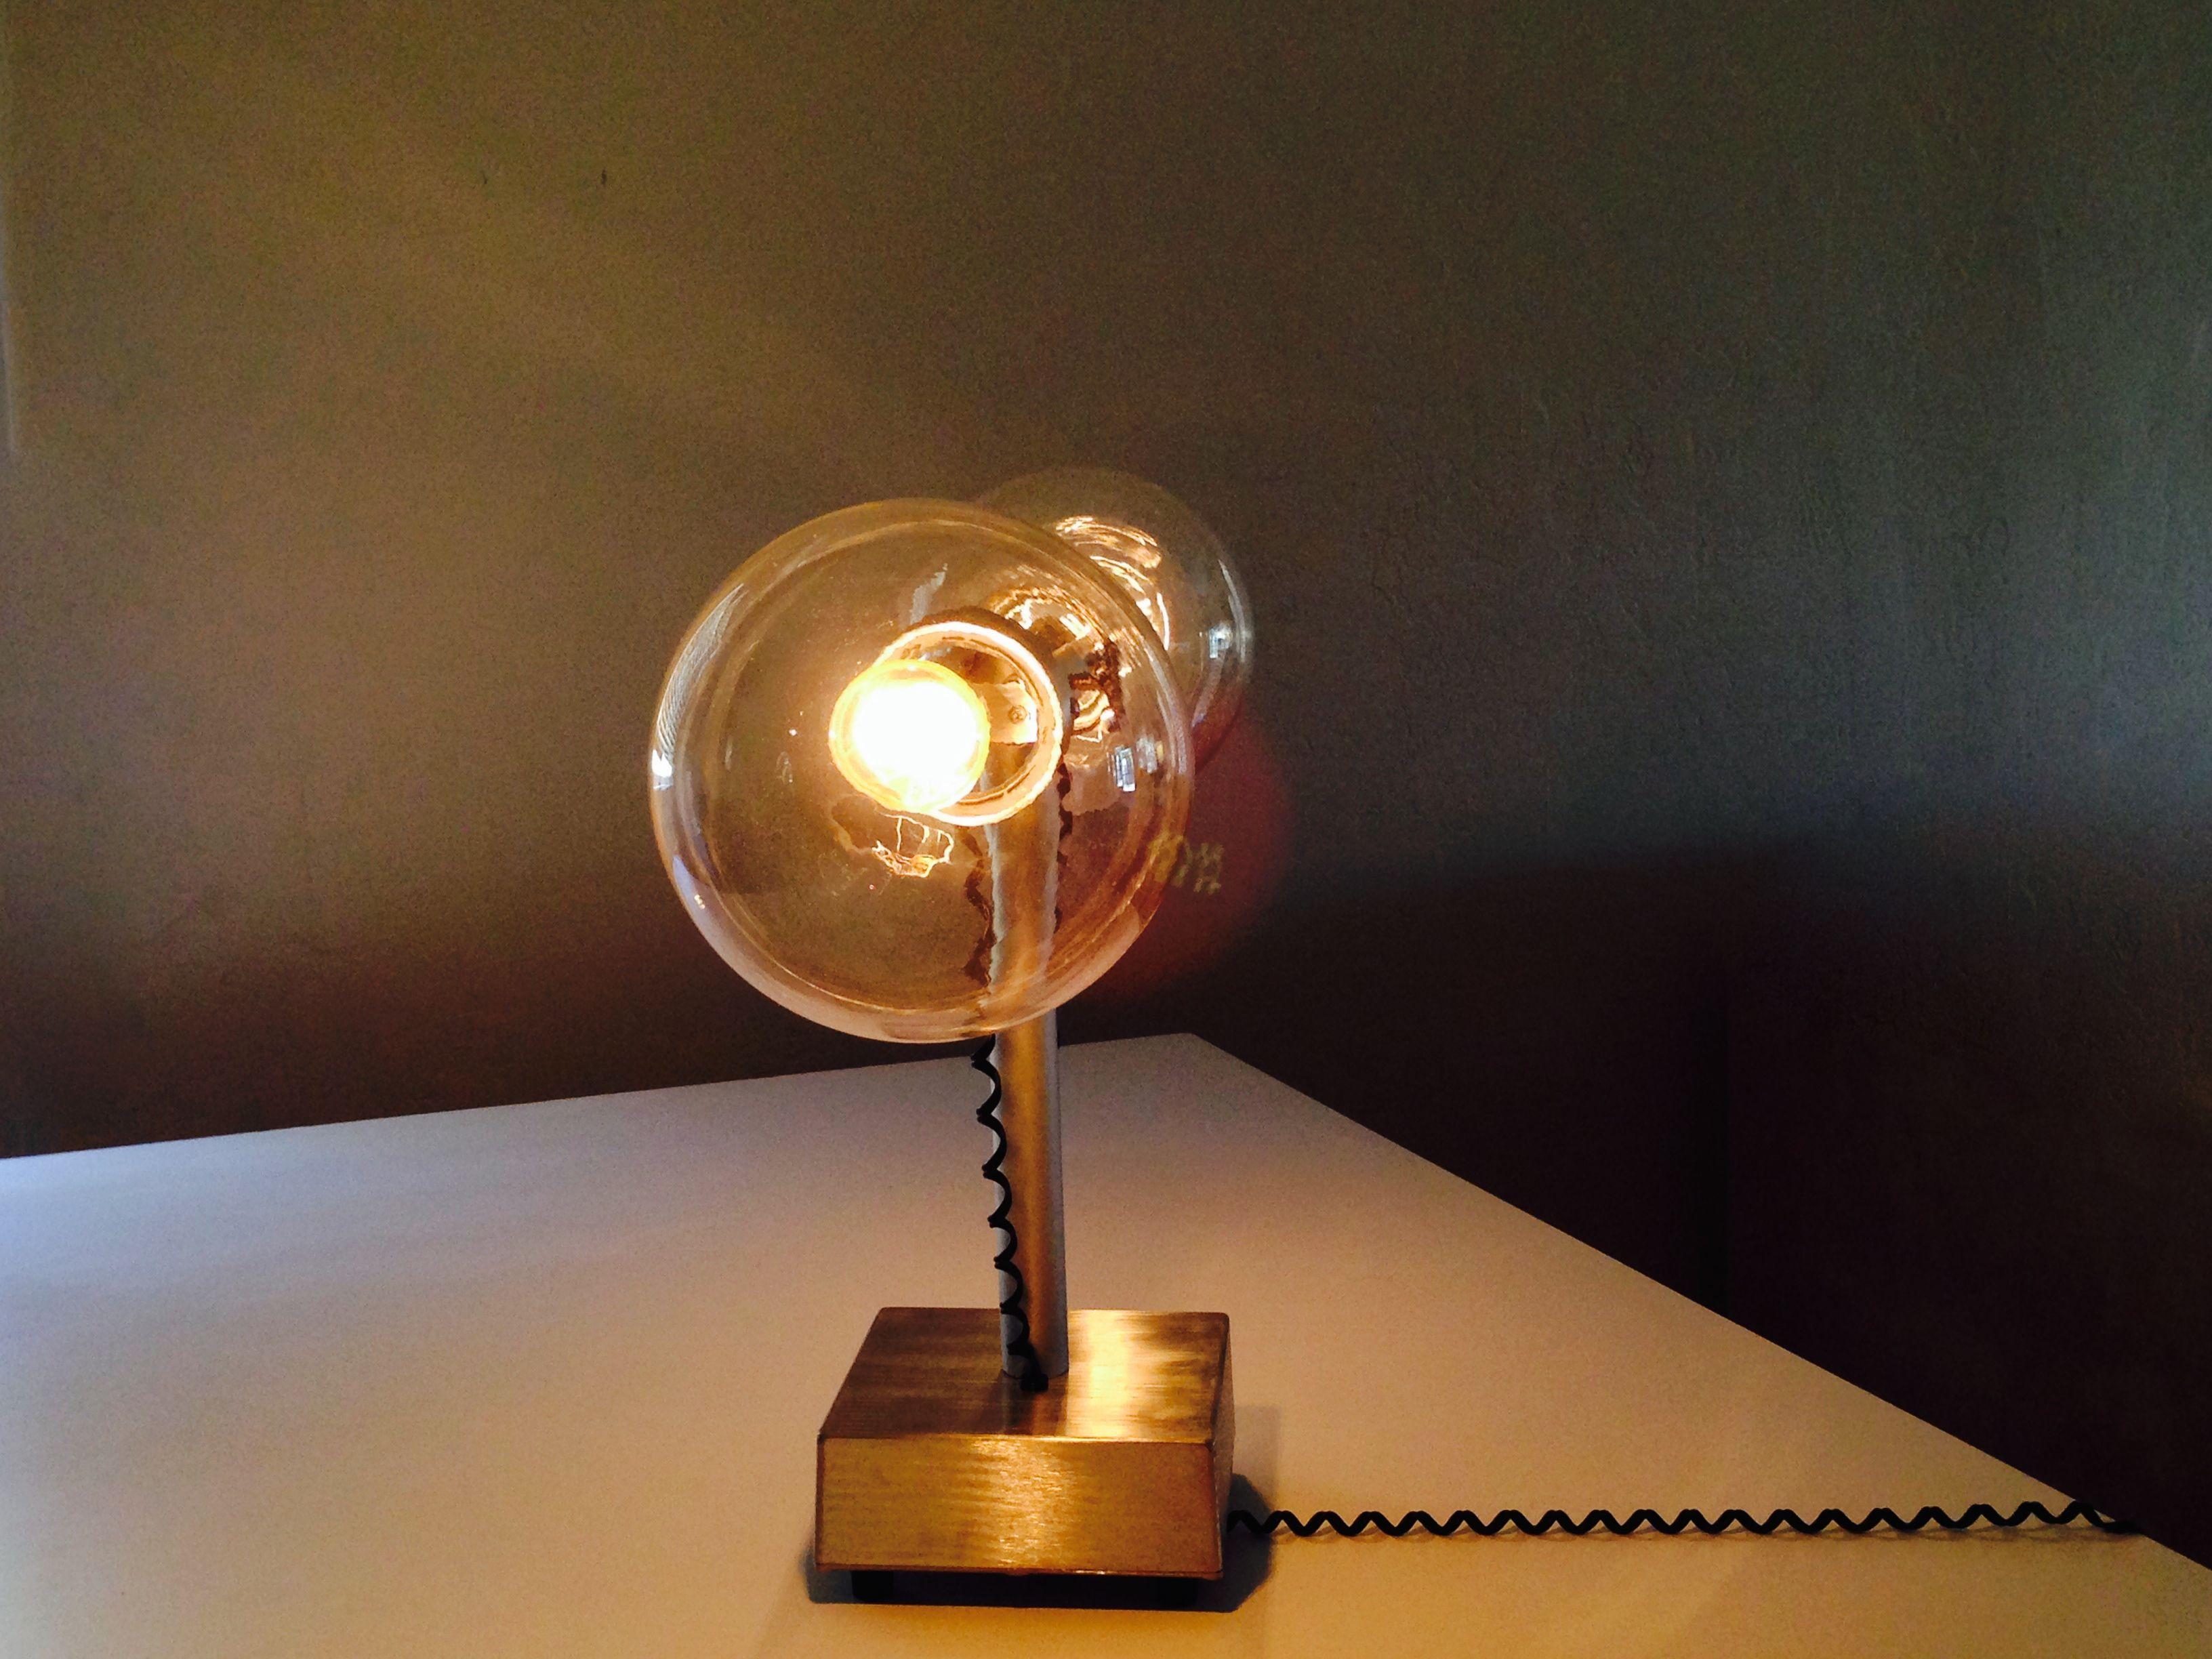 dale rorabaugh is raising funds for franken edison light its alive on kickstarter captivating light art piece that interprets edisons light bulbs - Captivating Light Installation Artists